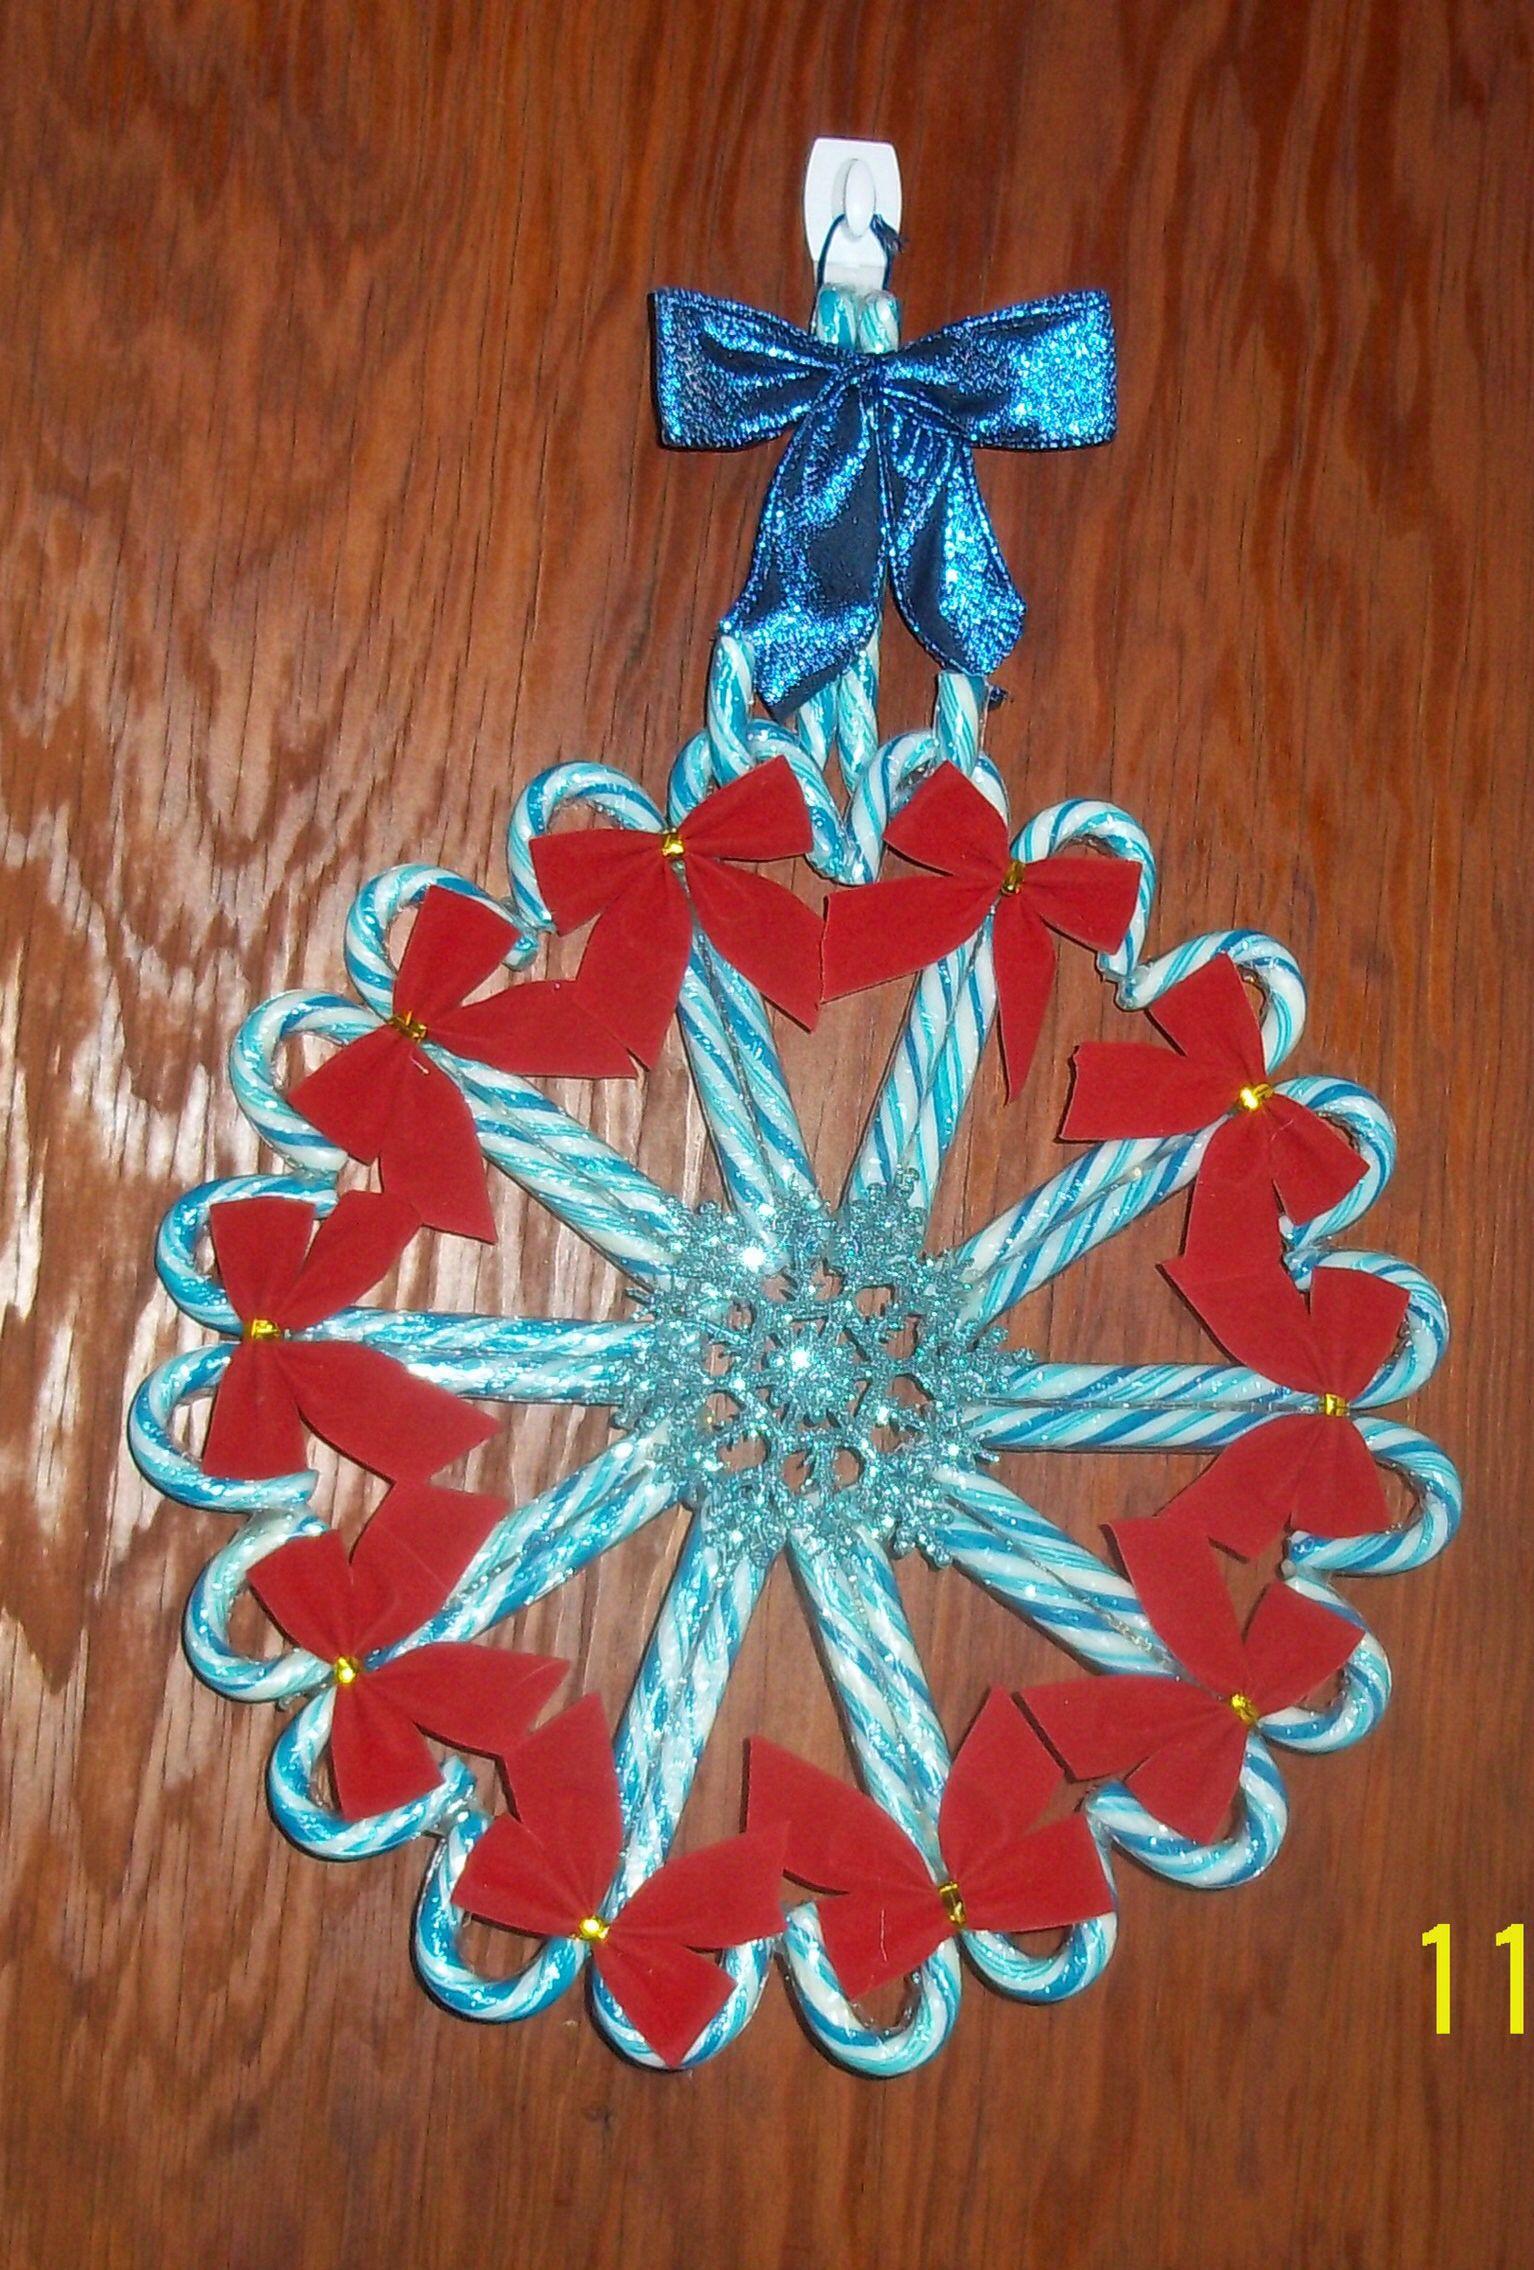 Blue Candy Cane Wreath So Far My Favorite Wreath